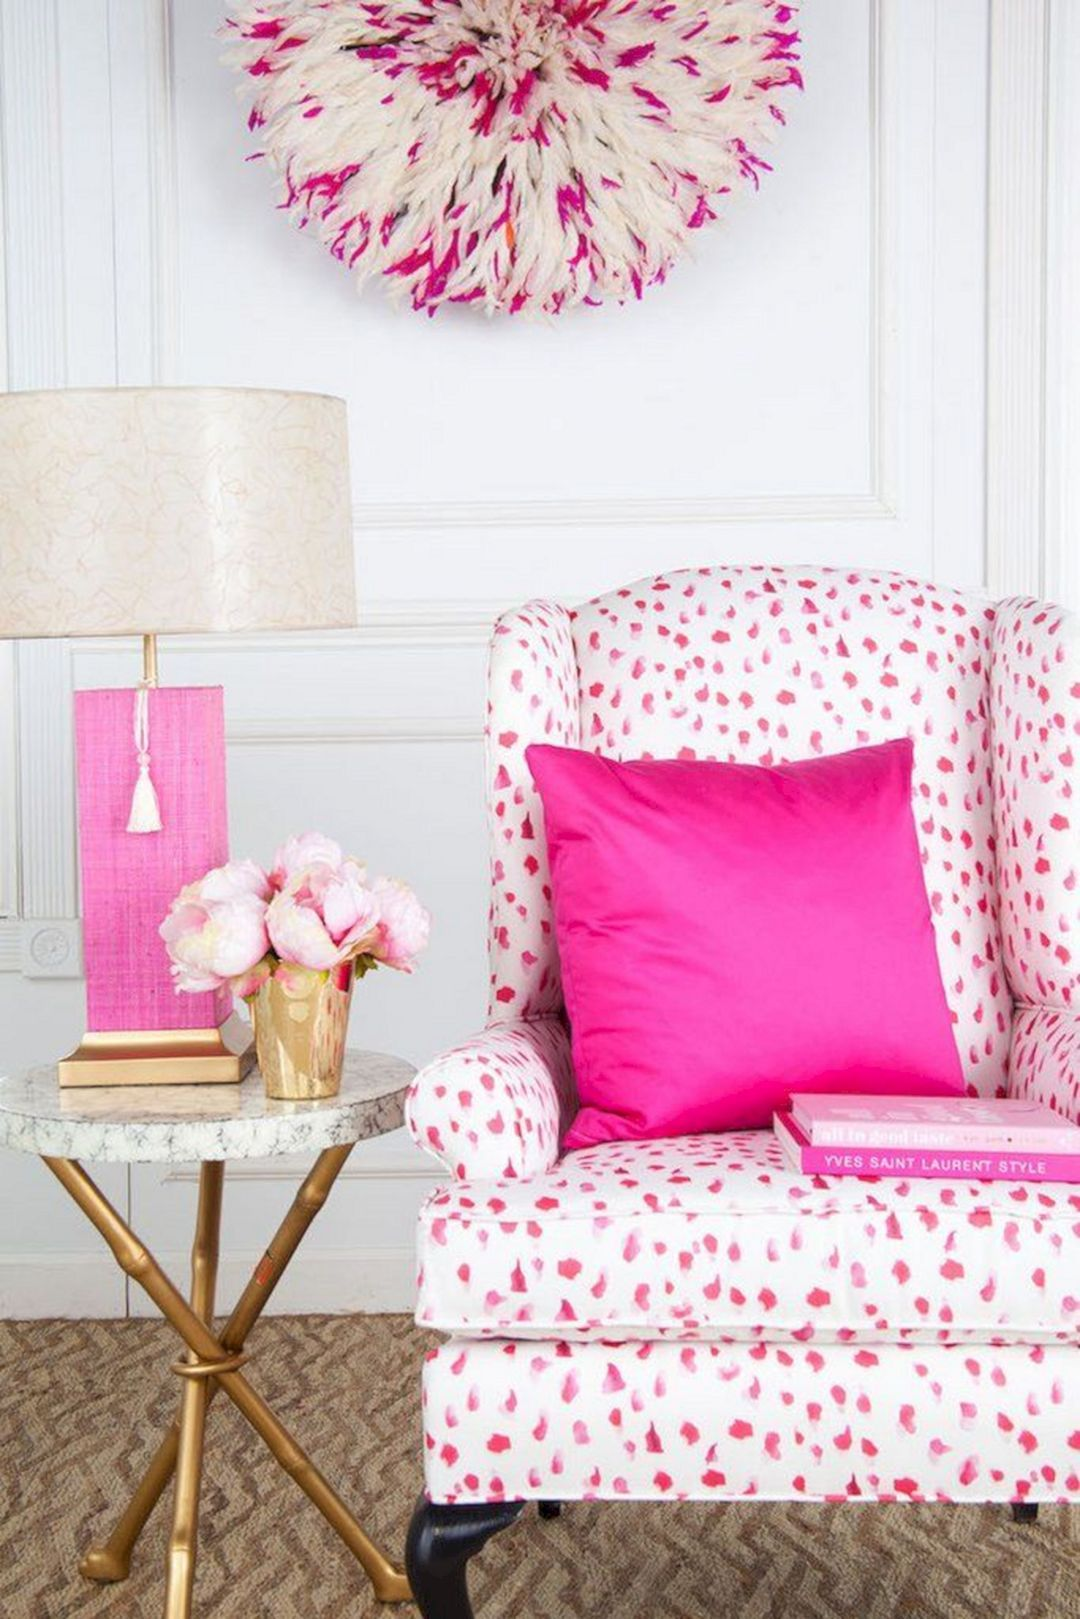 color scheme for office. Phenomenal 25+ Most Romantic Pink Home Offices Color Scheme Ideas Http://goodsgn.com/interior/25-most-romantic-pink-home-offices-color-scheme -ideas/ For Office E